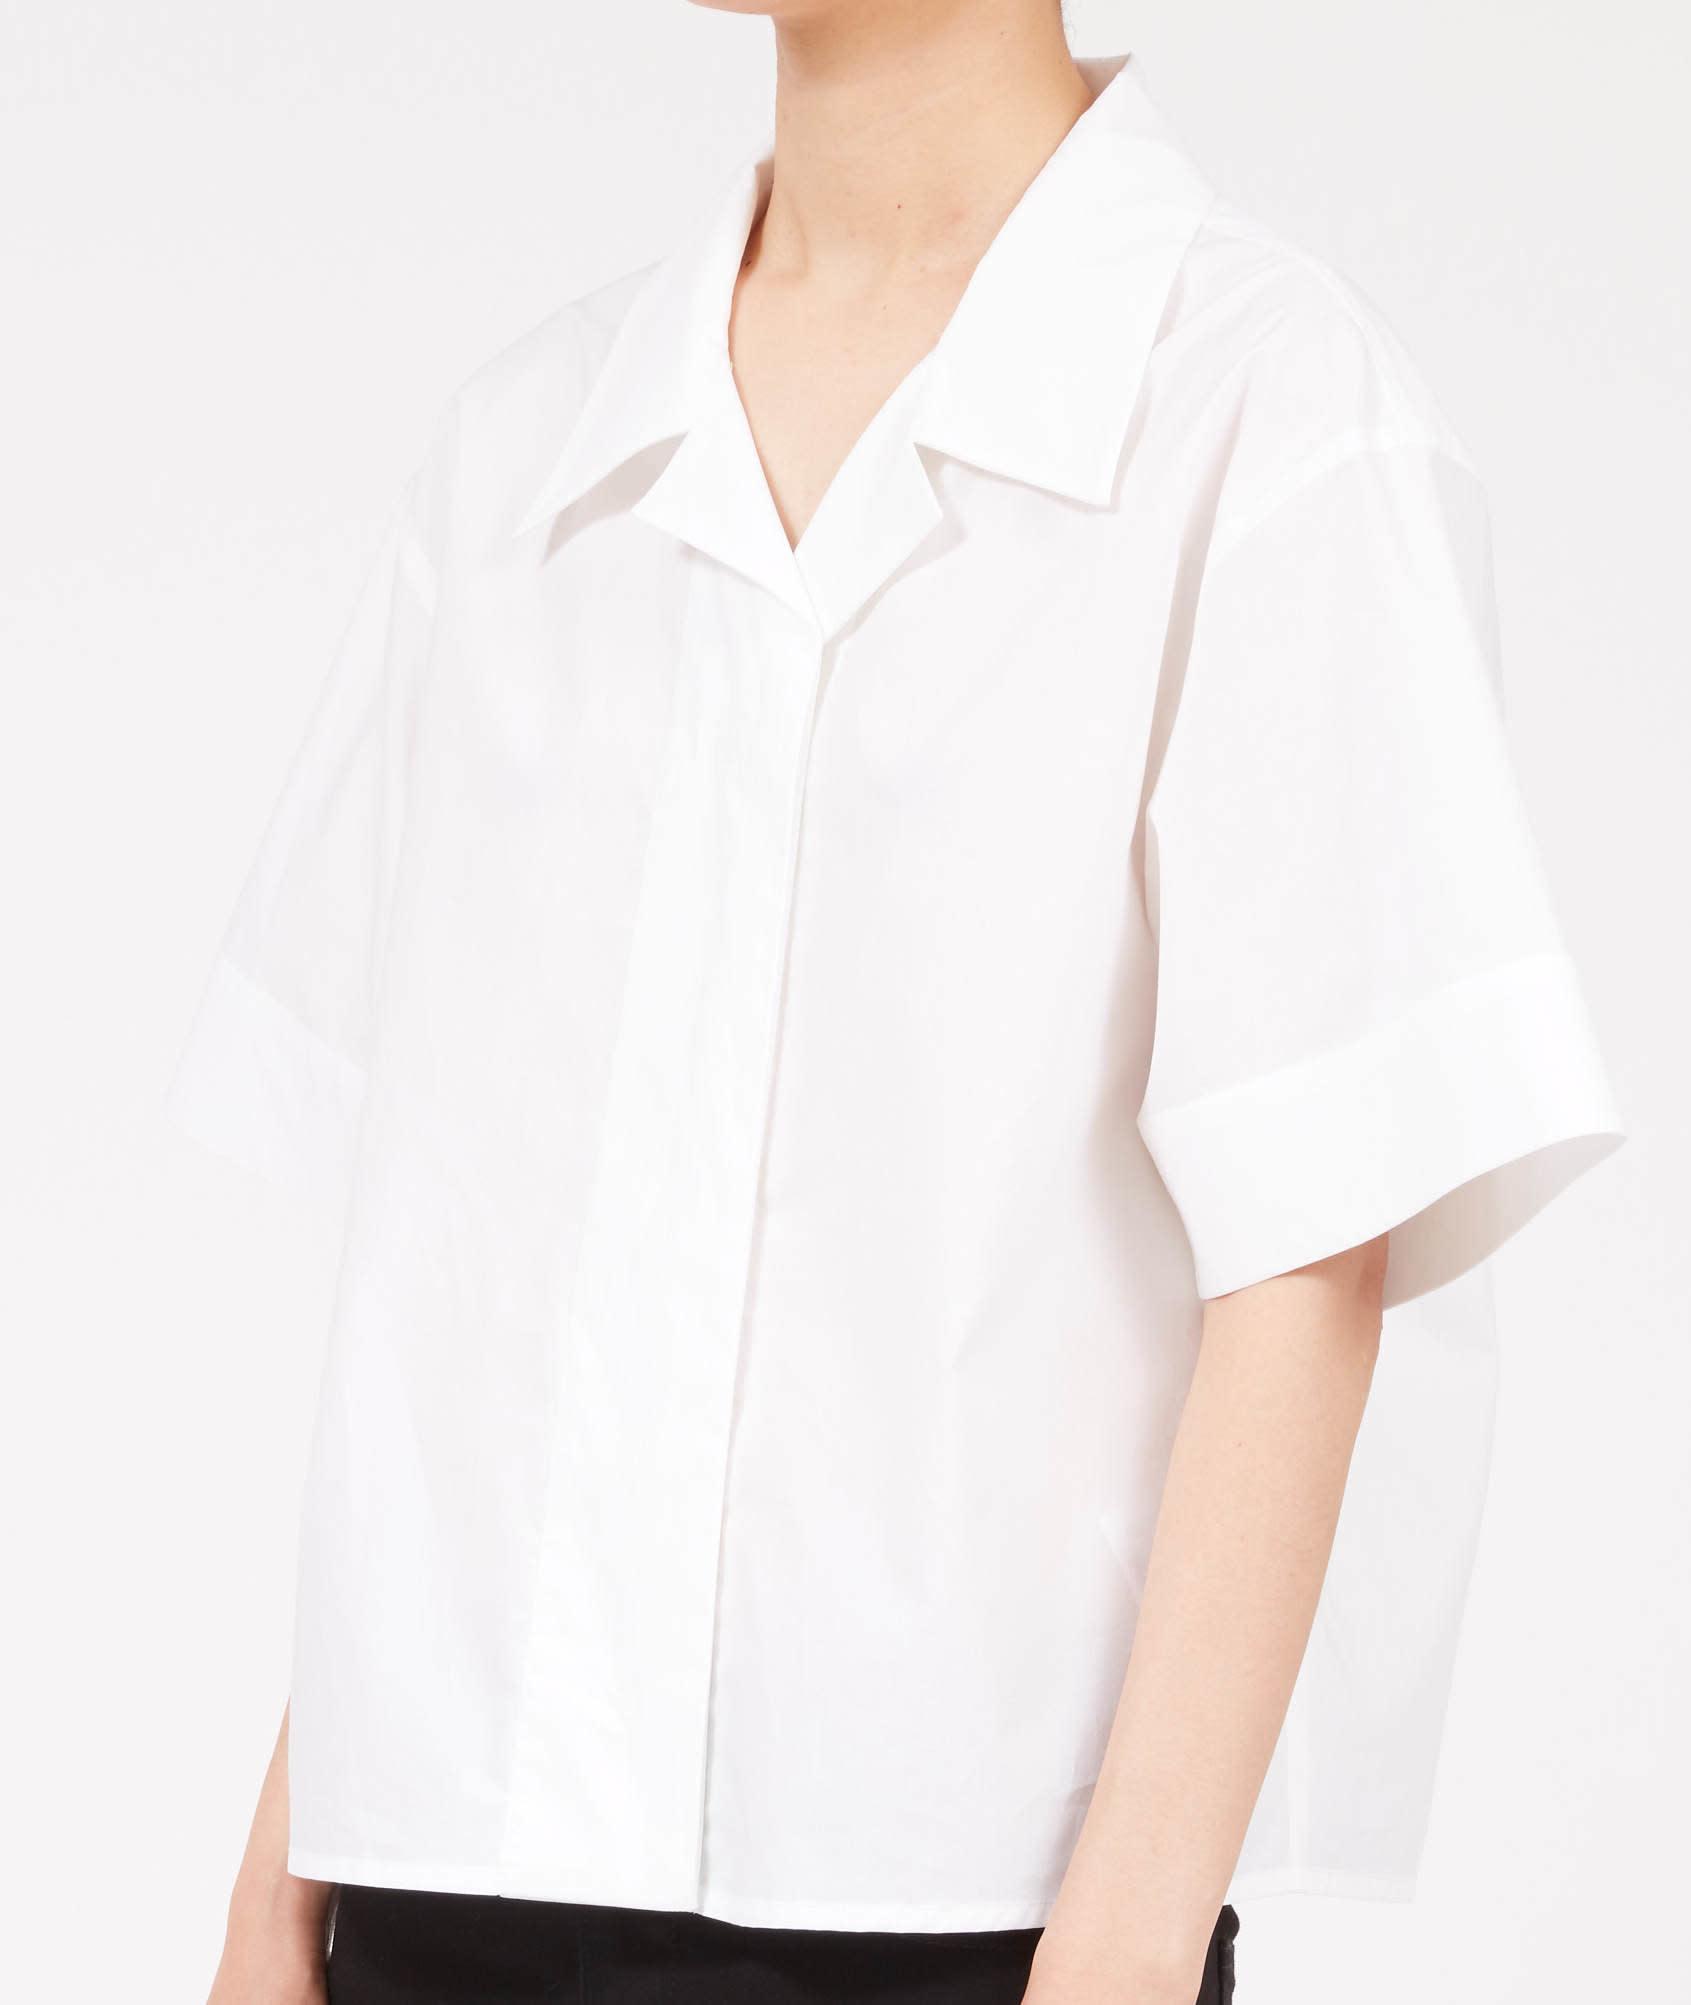 MM6 MAISON MARGIELA Camp shirt in White